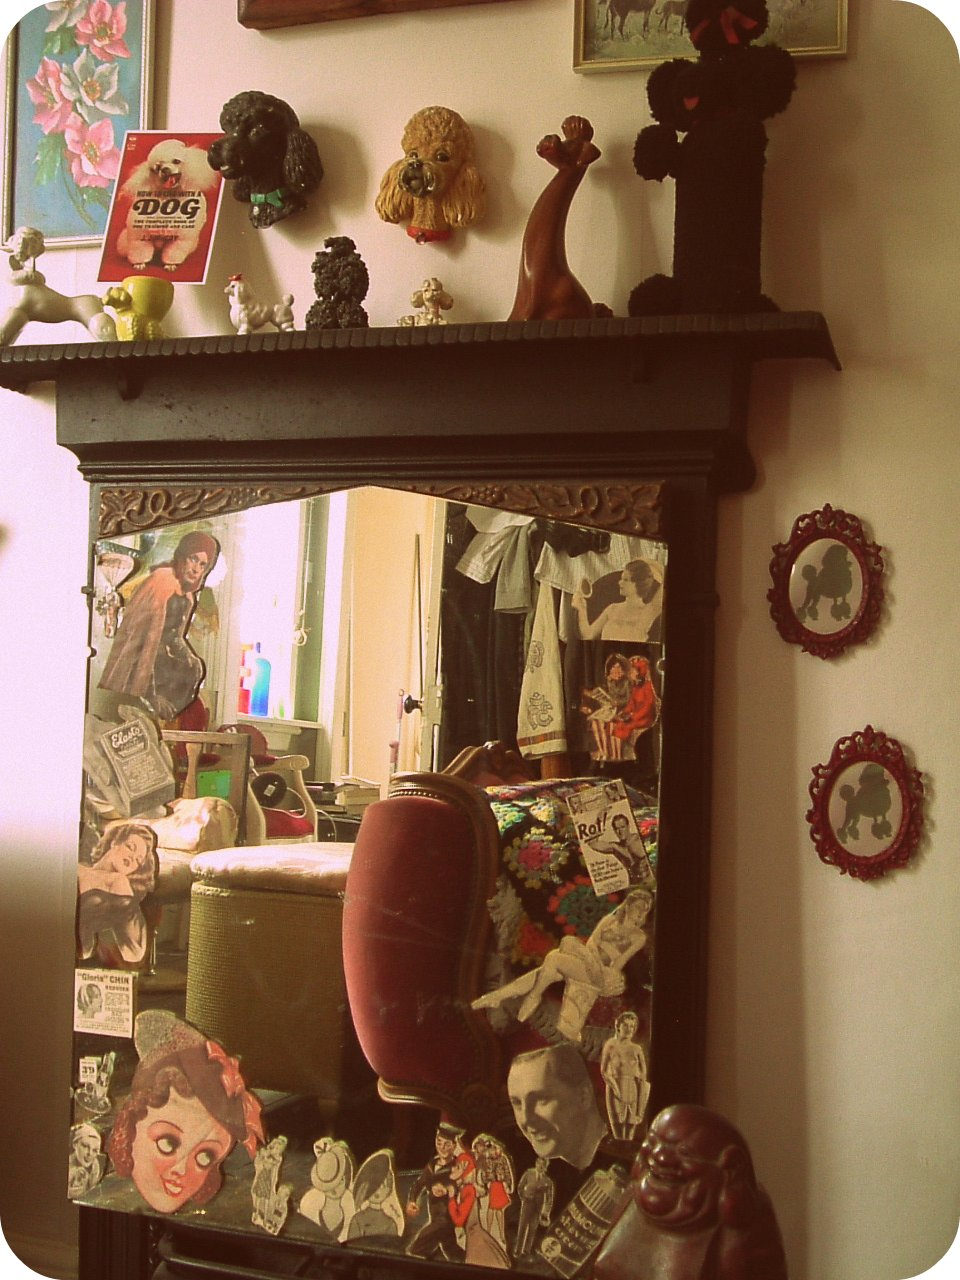 Vintage Vixen Fancy Some Bedroom Action